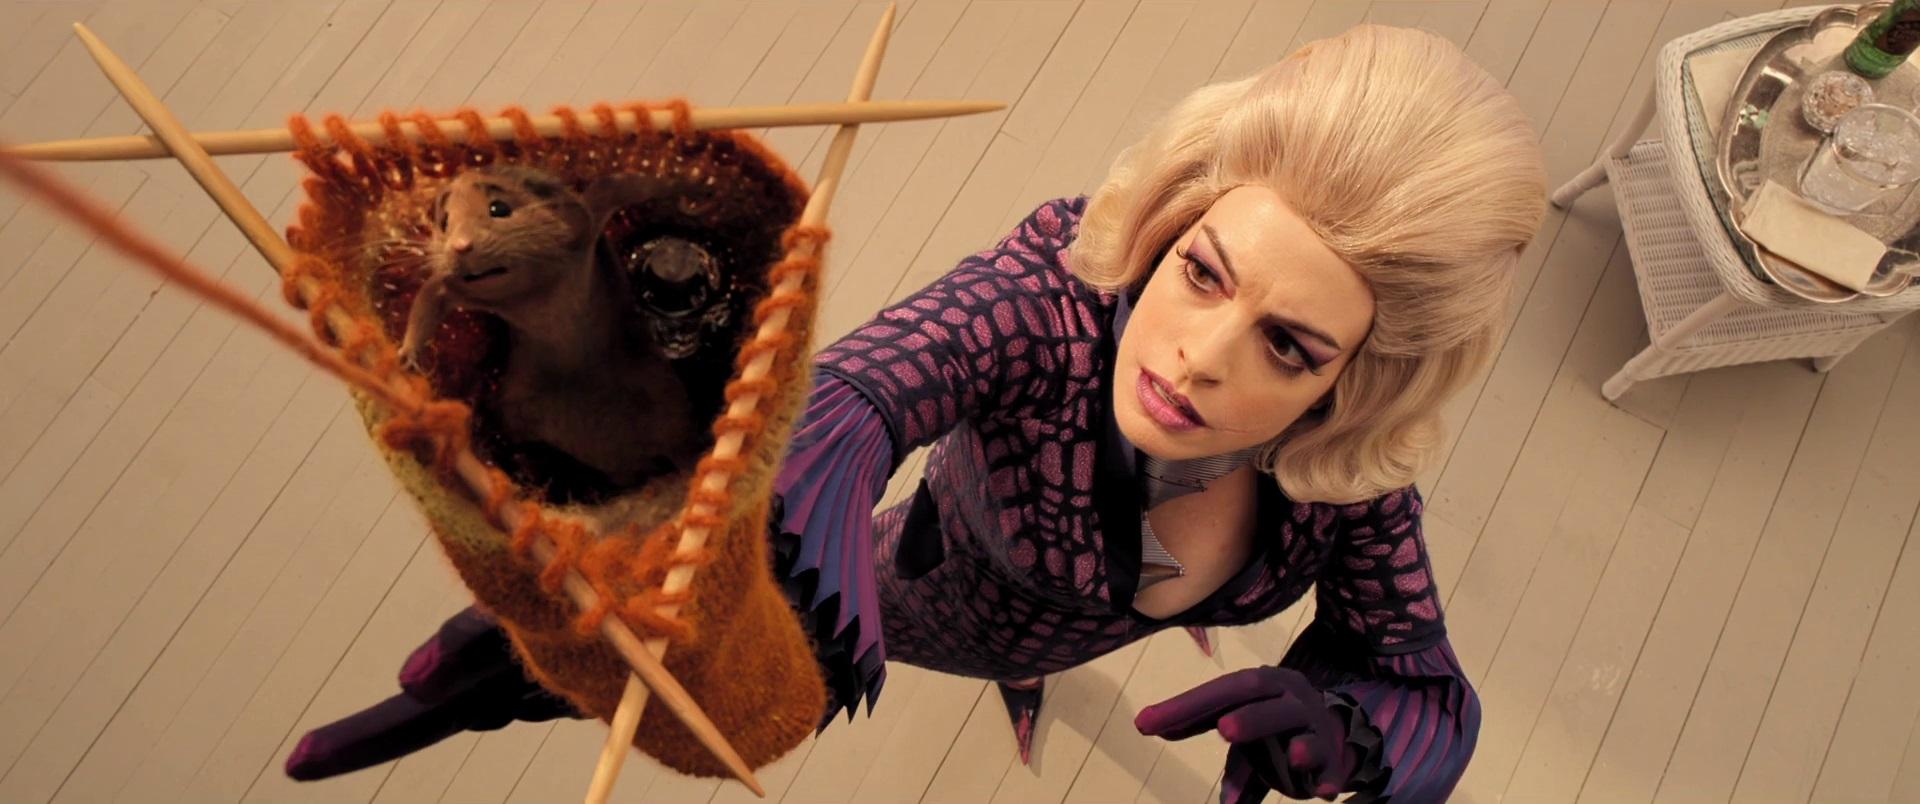 Cadılar | The Witches | 2020 | BDRip | XviD | Türkçe Dublaj | 1080p - m720p - m1080p | BluRay | Dual | TR-EN | Tek Link